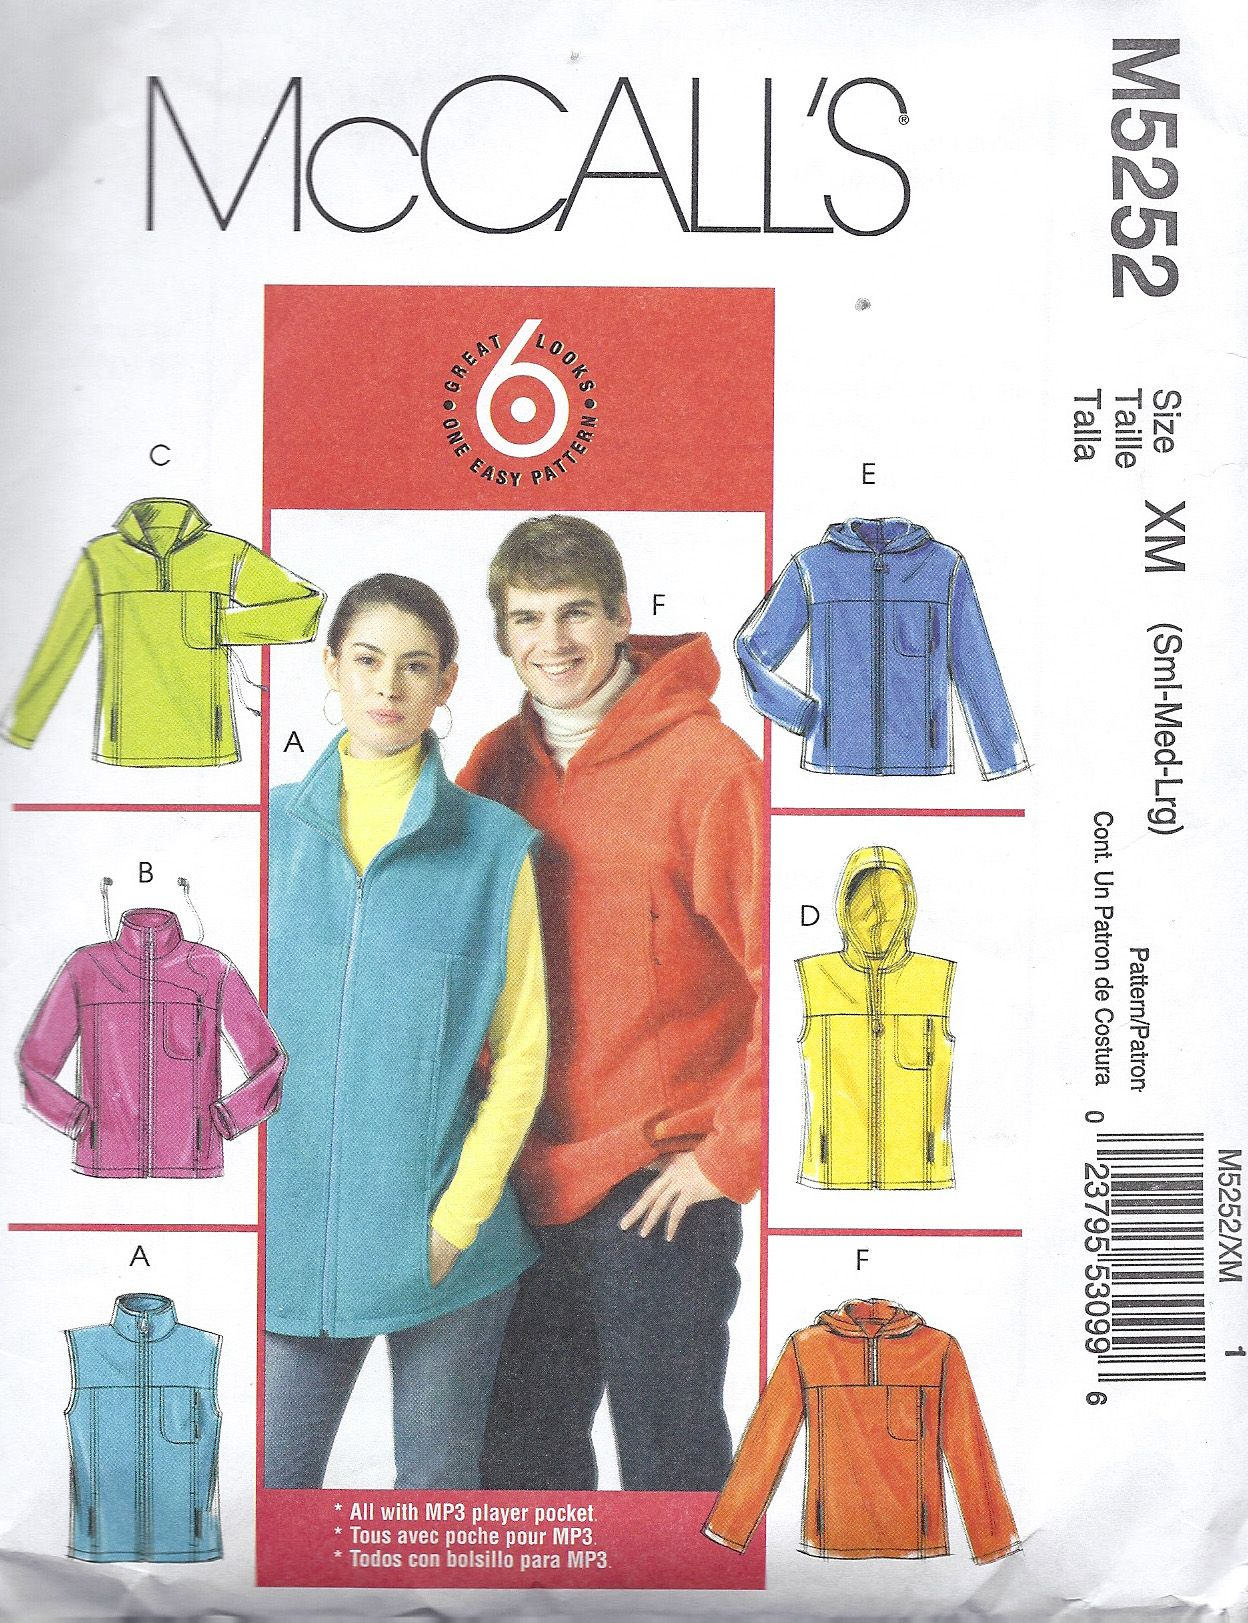 A Toasty Warm Fleece Jacket-McCalls 5252 Pattern Review | Pattern ...